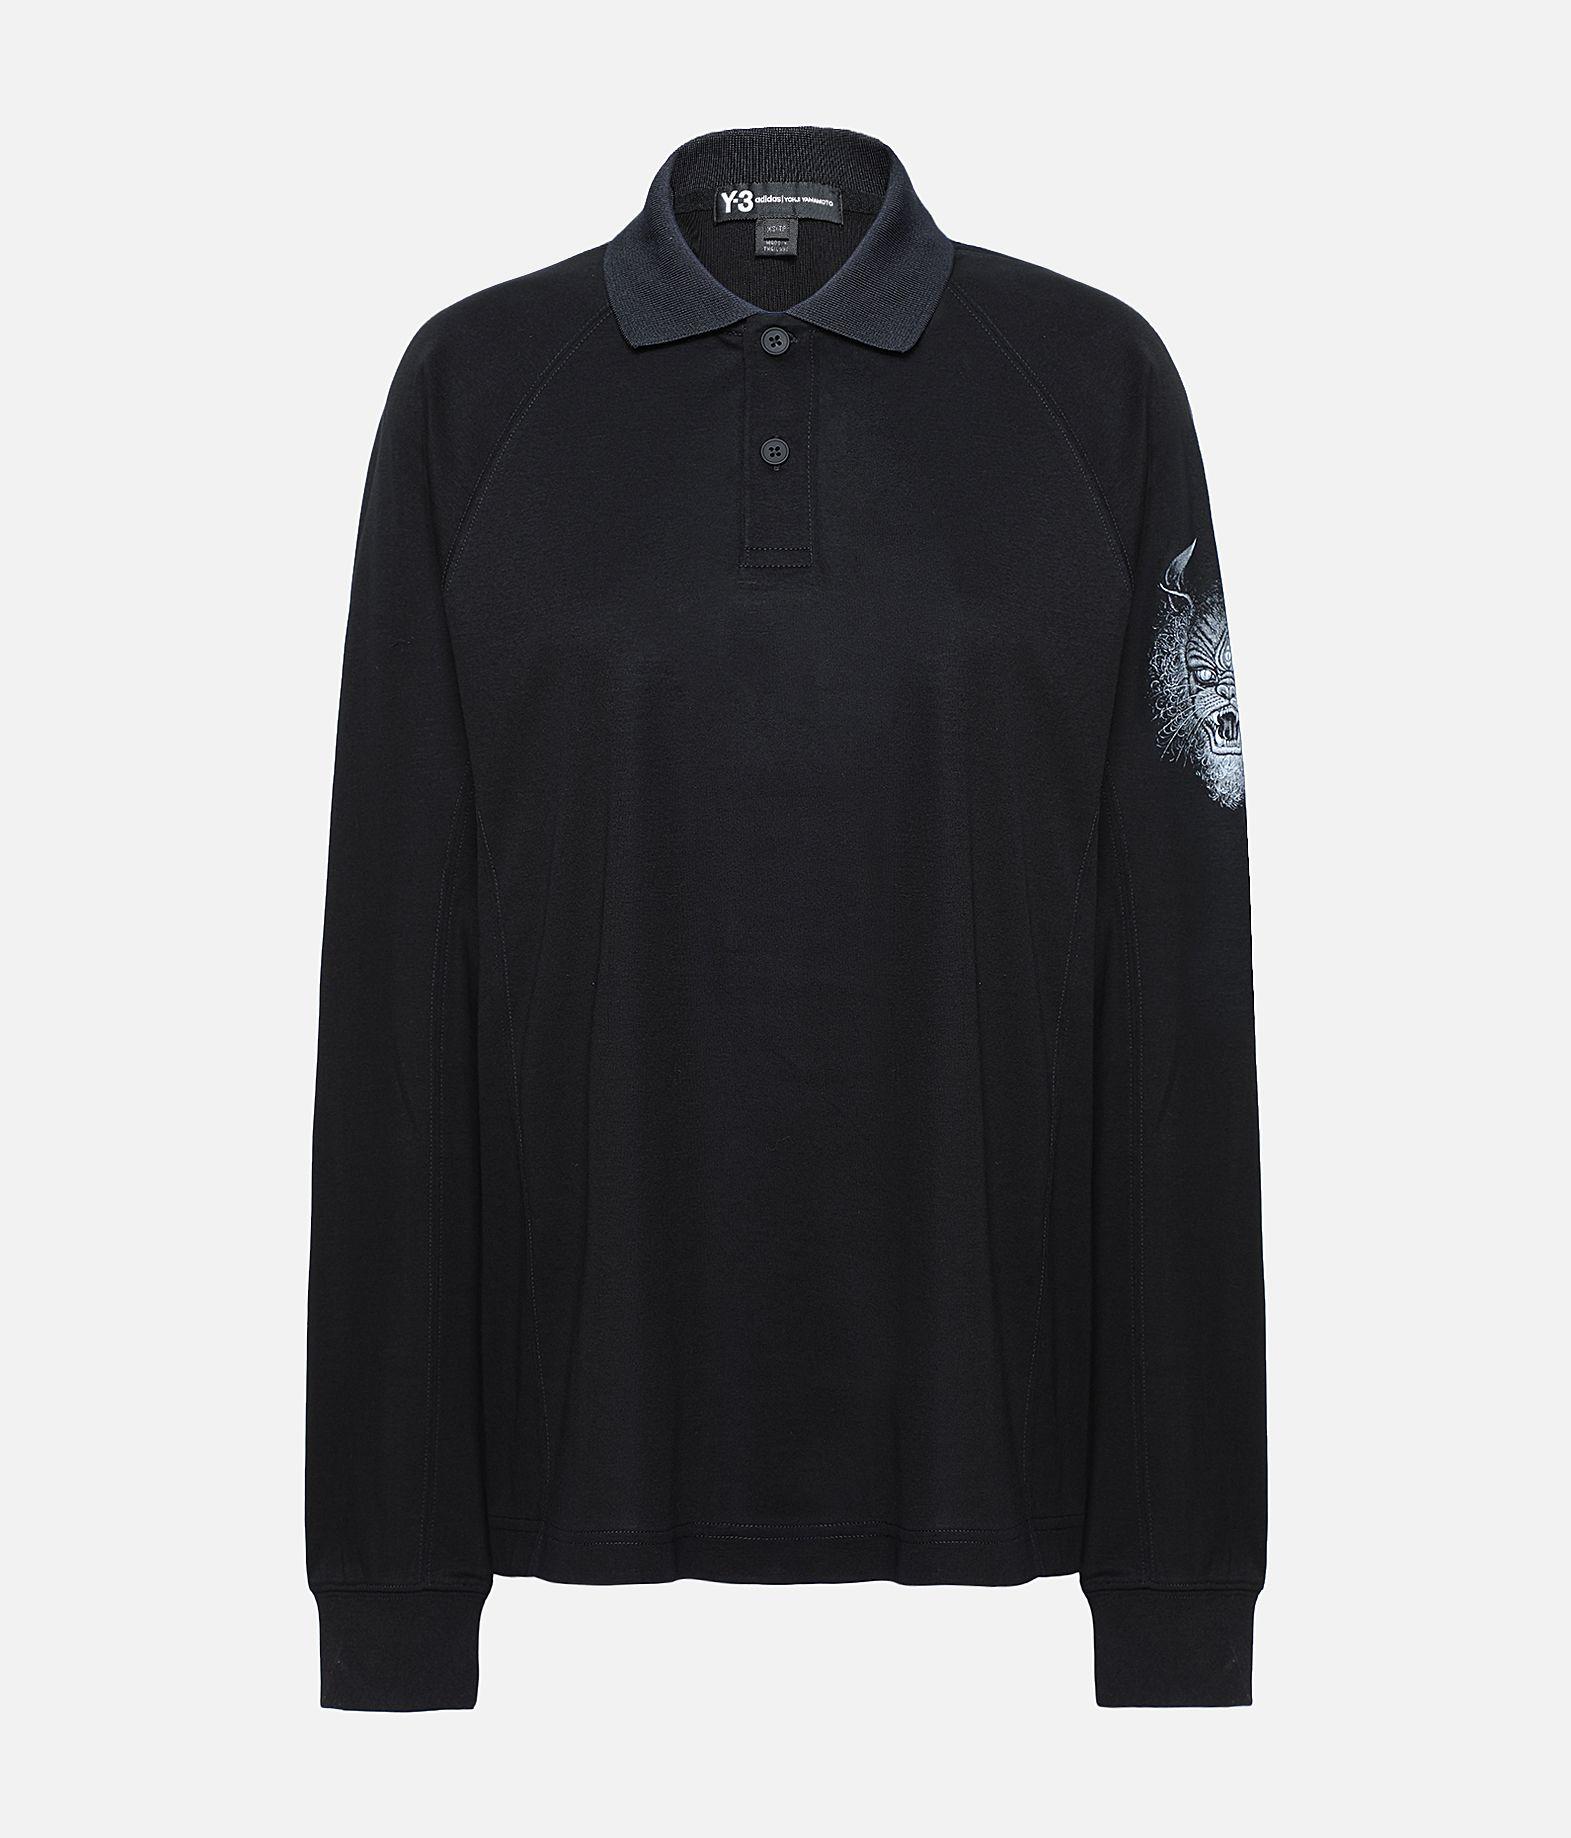 Y-3 Y-3 Long Sleeve Polo Shirt  Polohemd Dame f